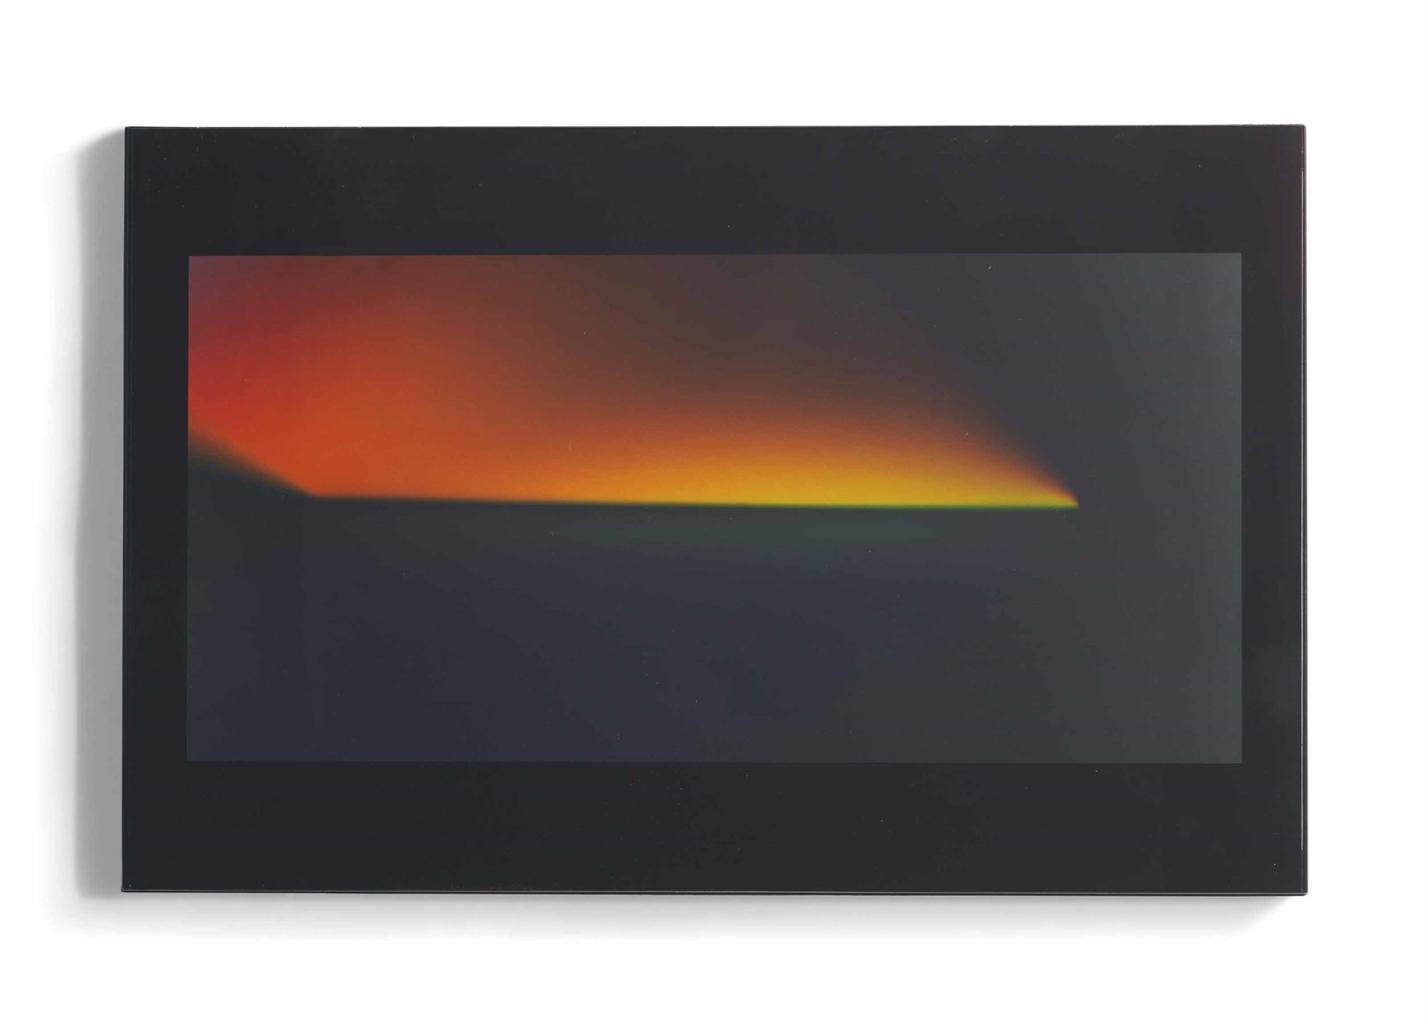 James Turrell-Untitled (VI M)-2003